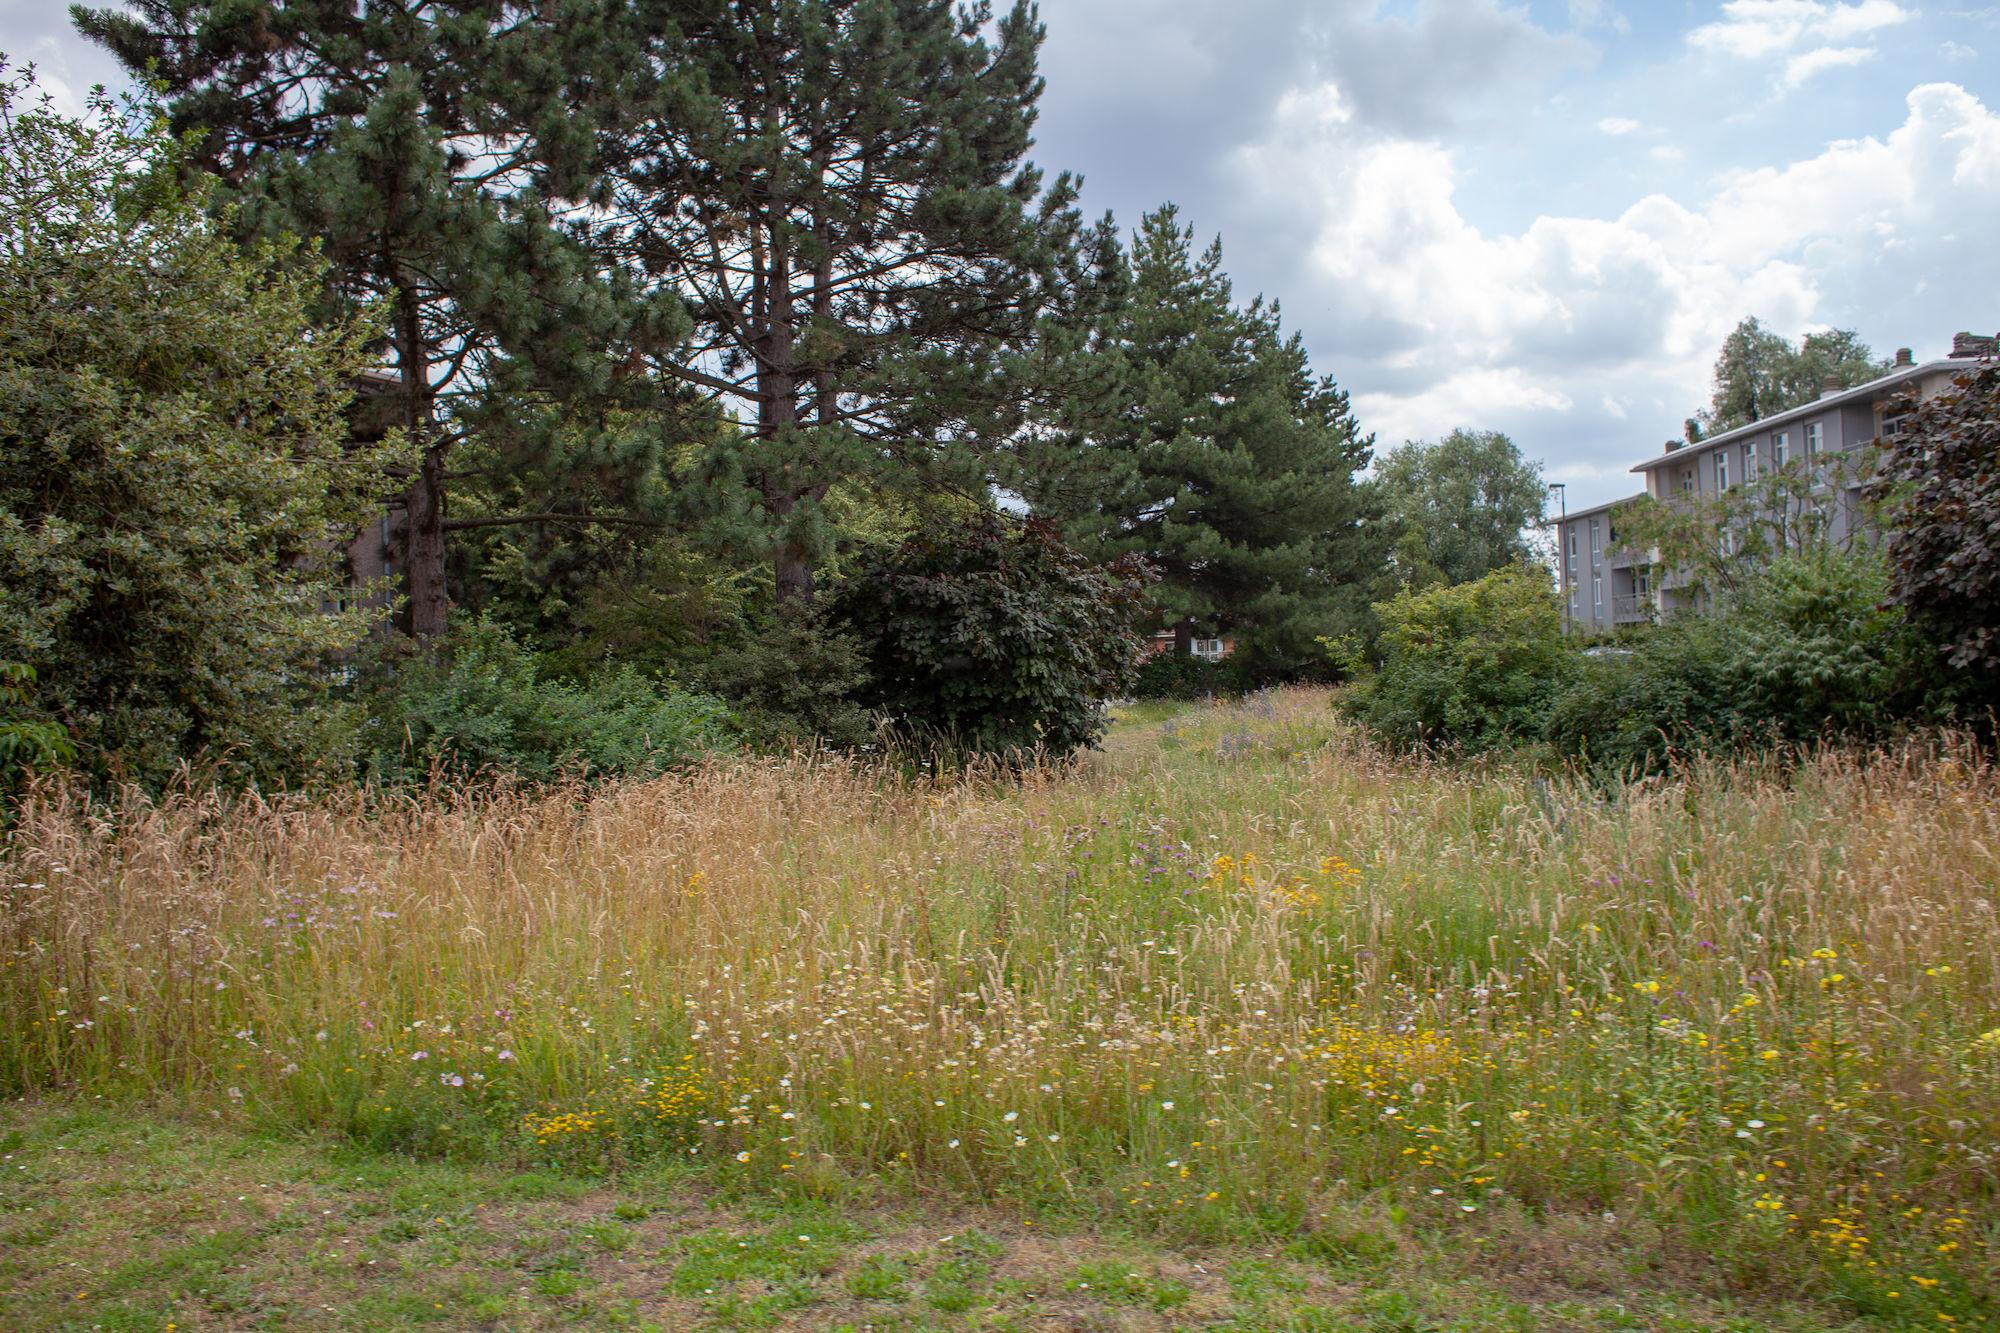 2019-07-02 Muide Meulestede prospectie Wannes_stadsvernieuwing_IMG_0354-3.jpg